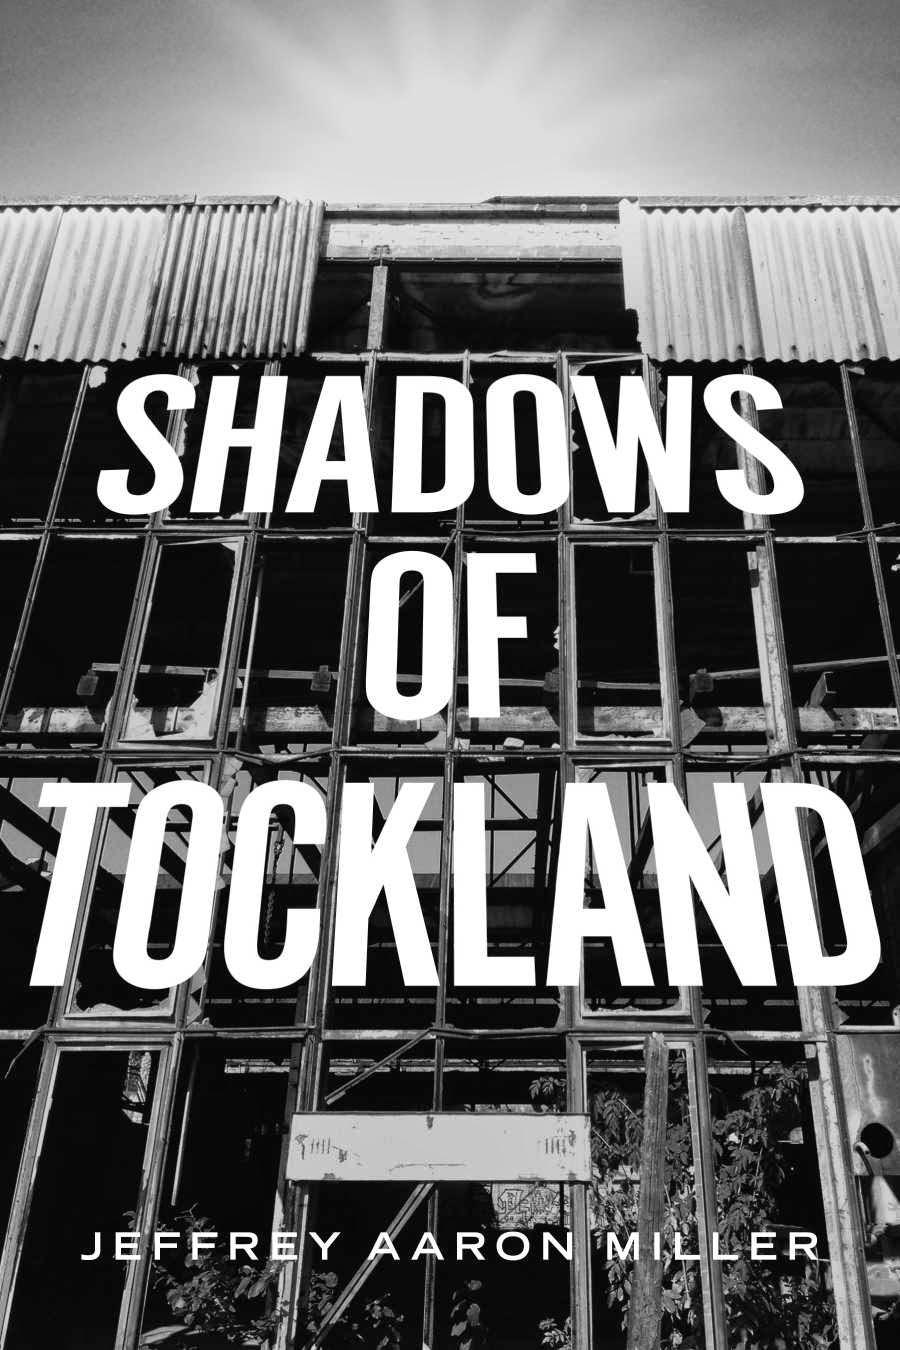 http://www.jeffreyaaronmiller.com/p/shadows-of-tockland.html